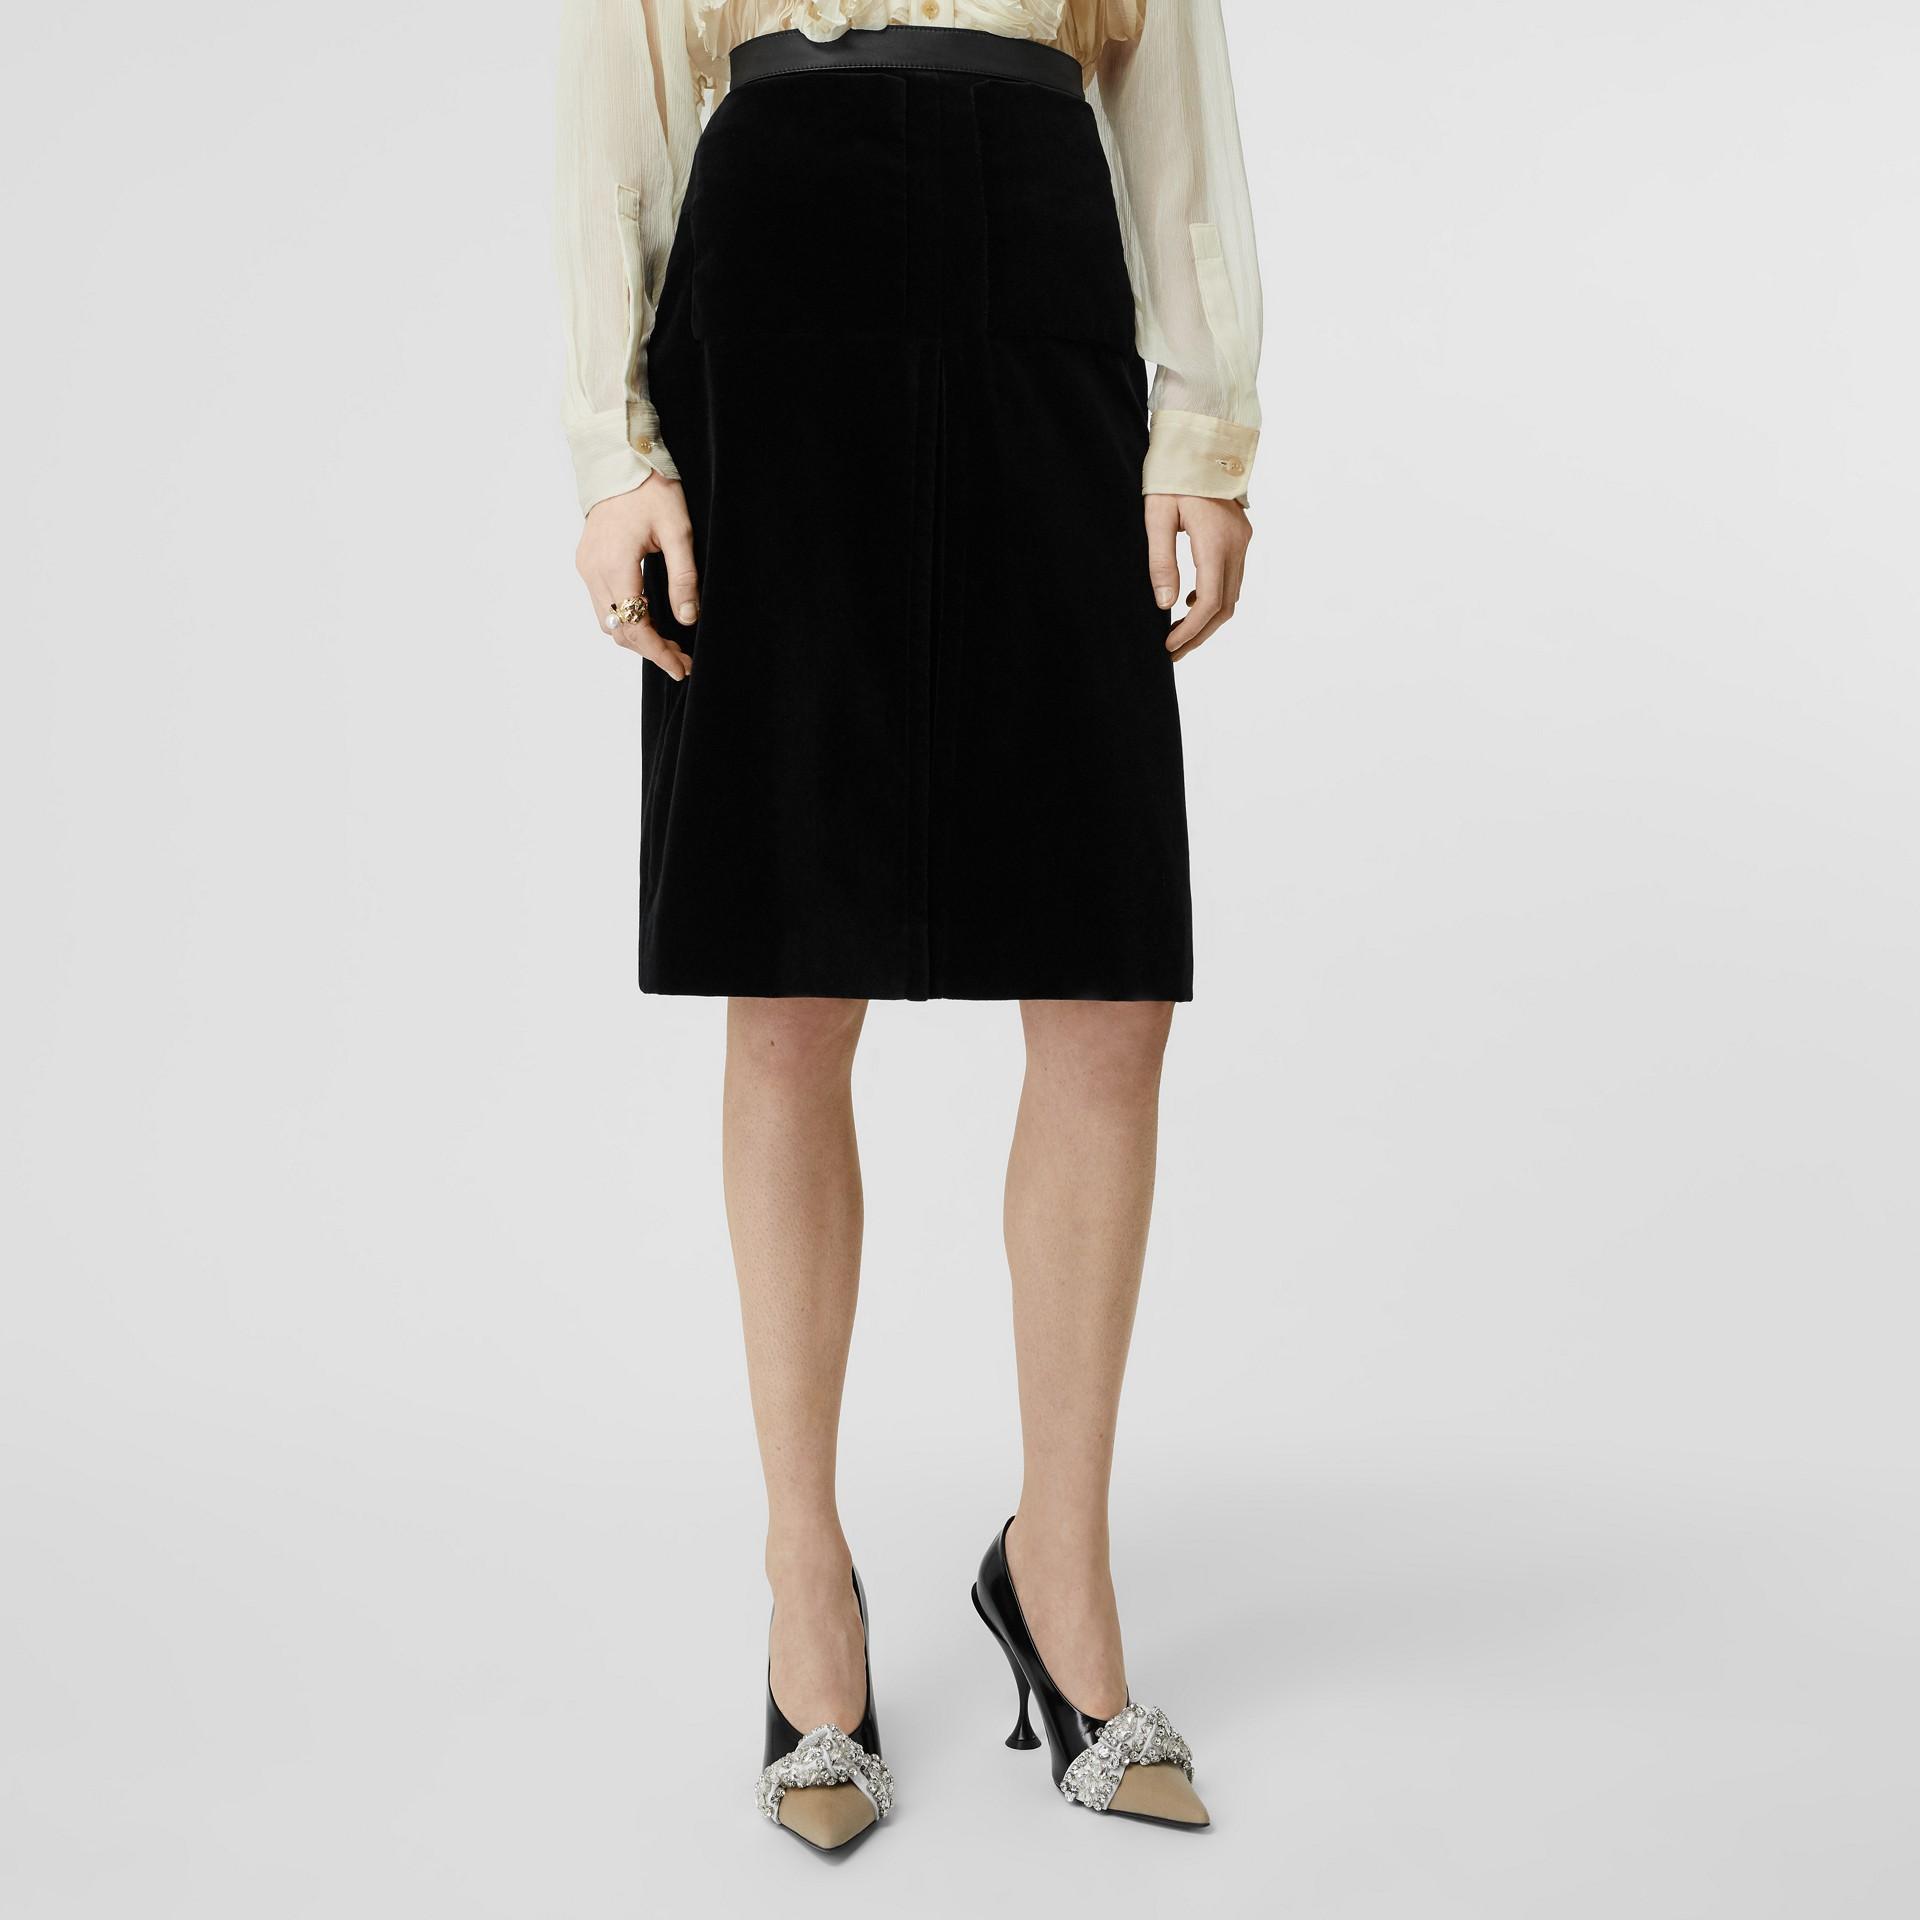 Lambskin Trim Box Pleat Detail Velvet and Wool Skirt in Black - Women | Burberry - gallery image 4